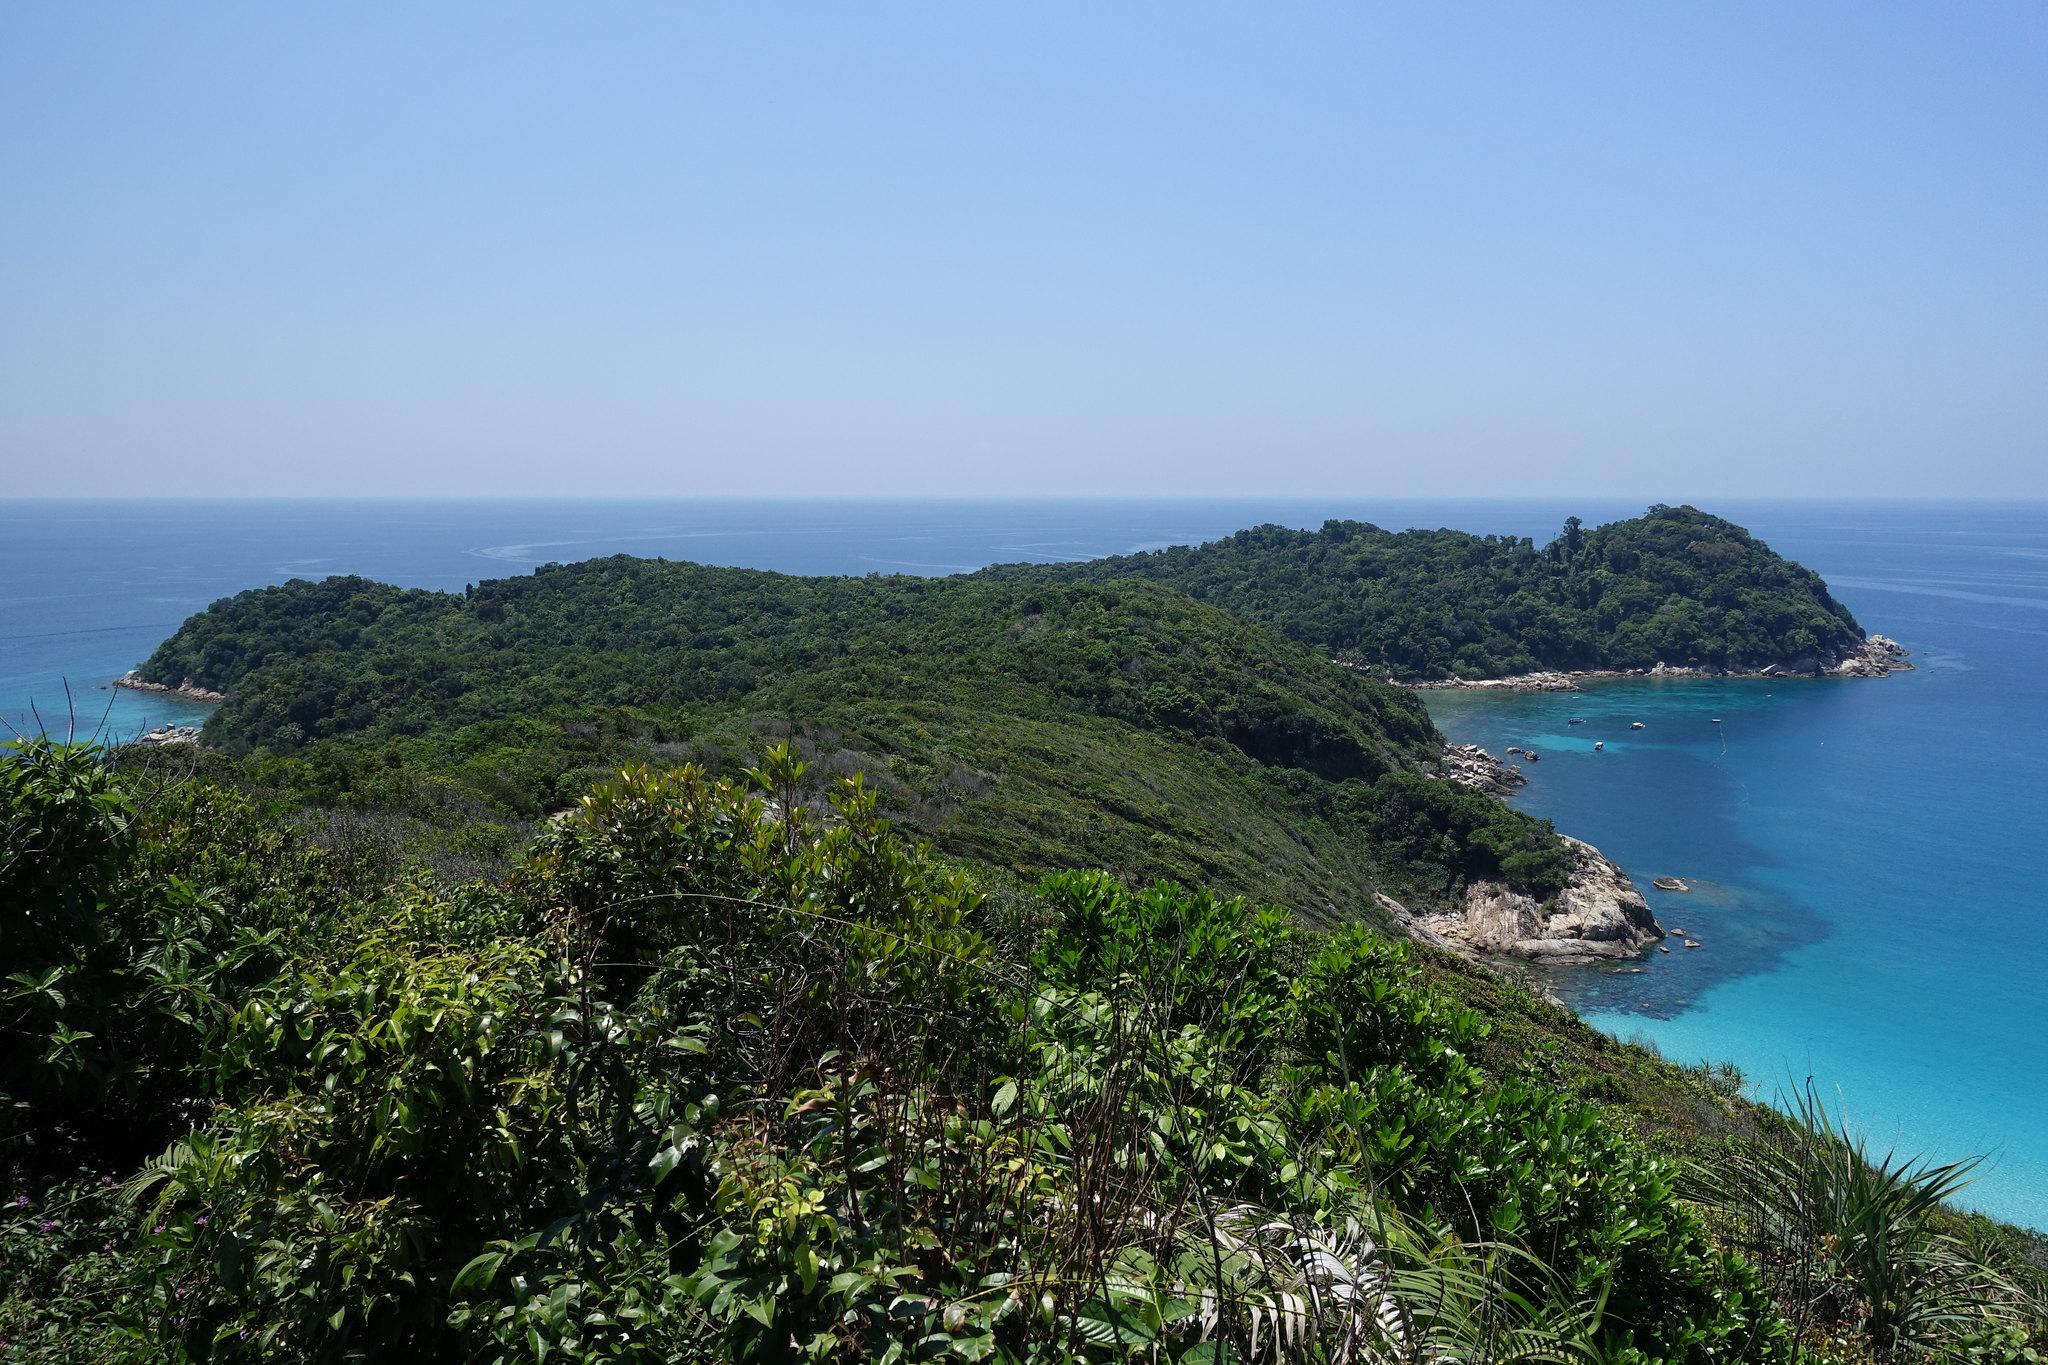 Pulau Perhentians